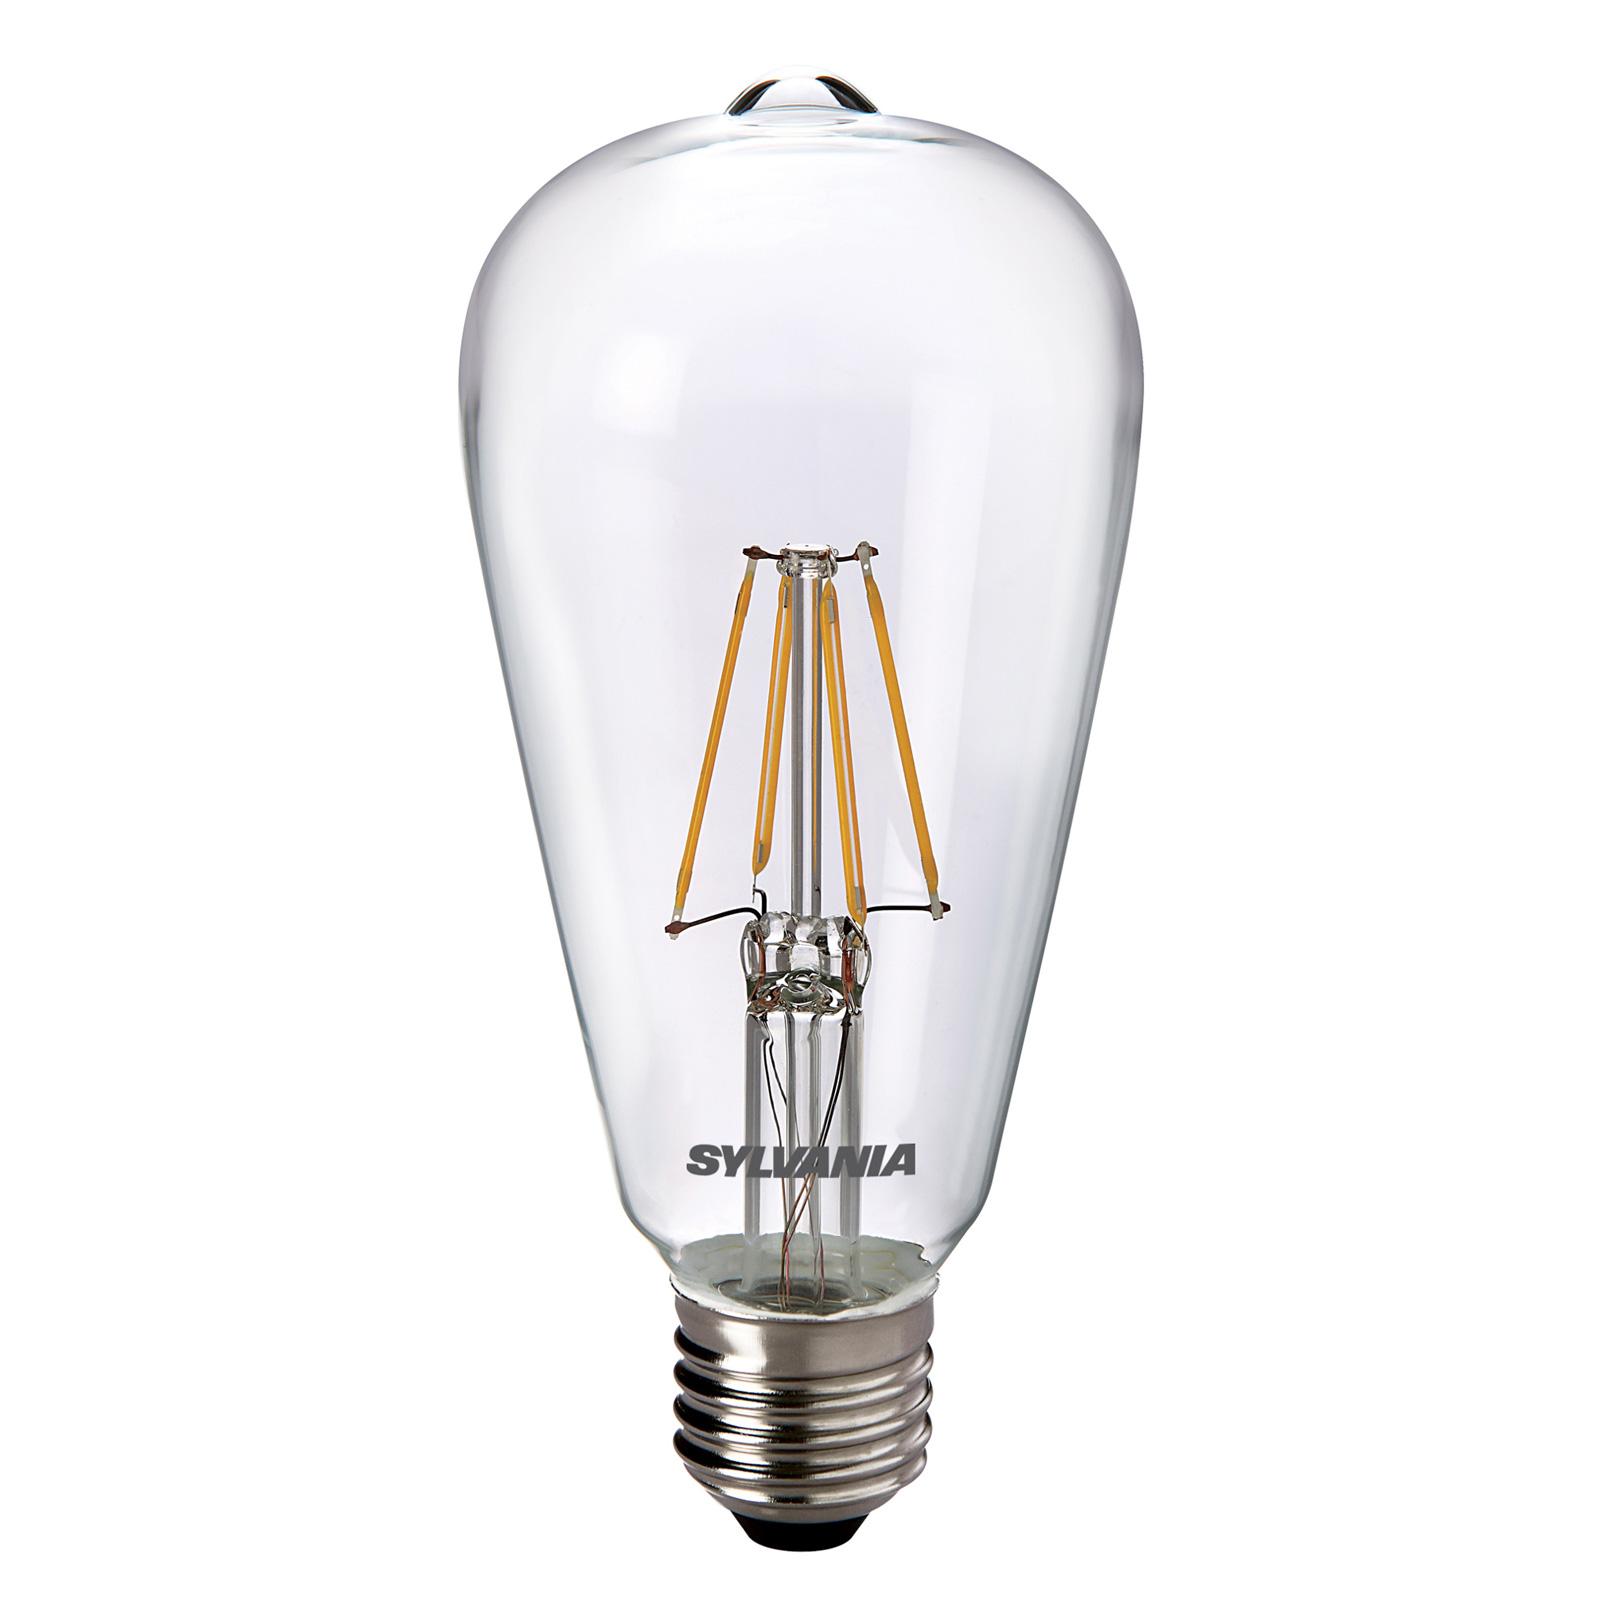 Żarówka LED E27 ToLEDo RT ST64 827 przezroczysta